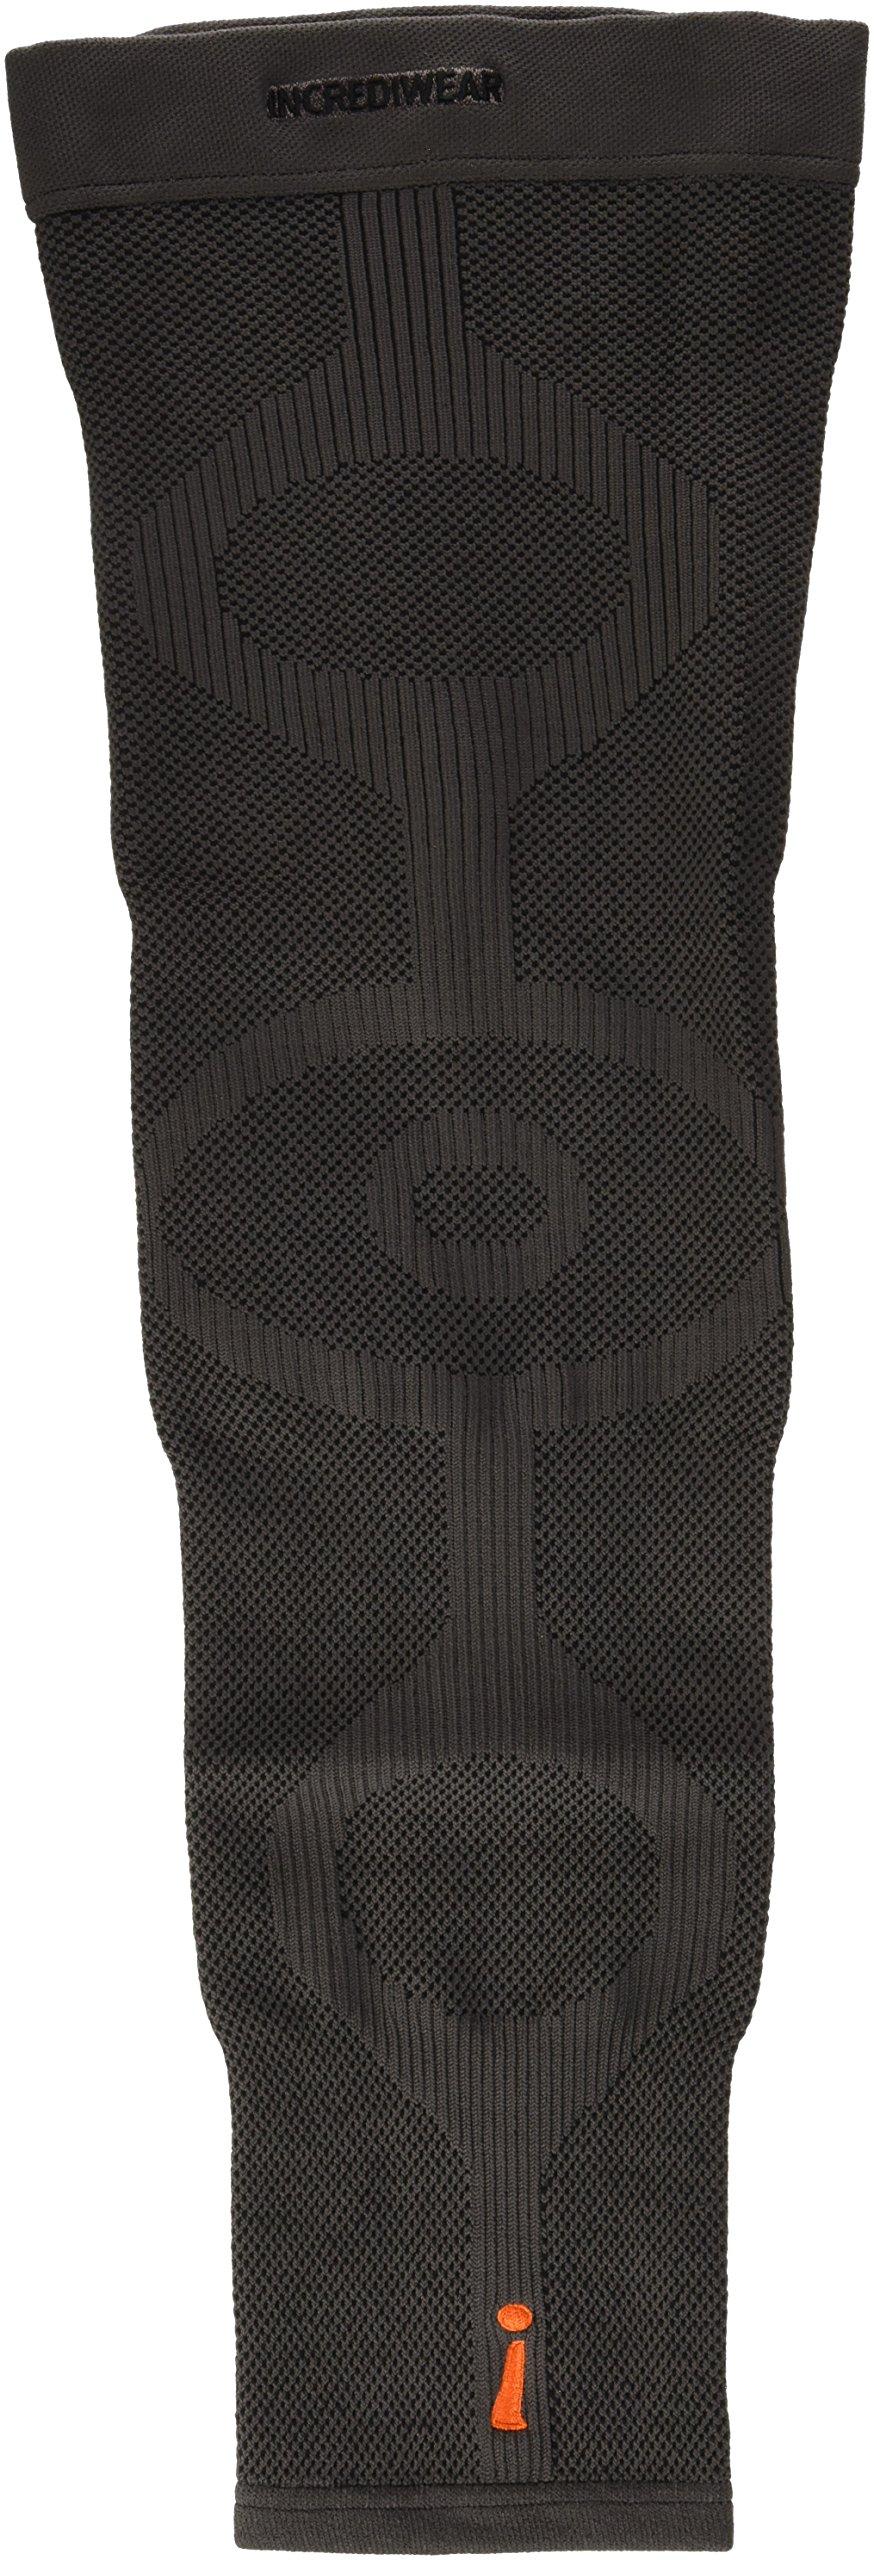 INCREDIWEAR Single Leg Sleeve, Charcoal, Large, 0.03 Pound by Incrediwear